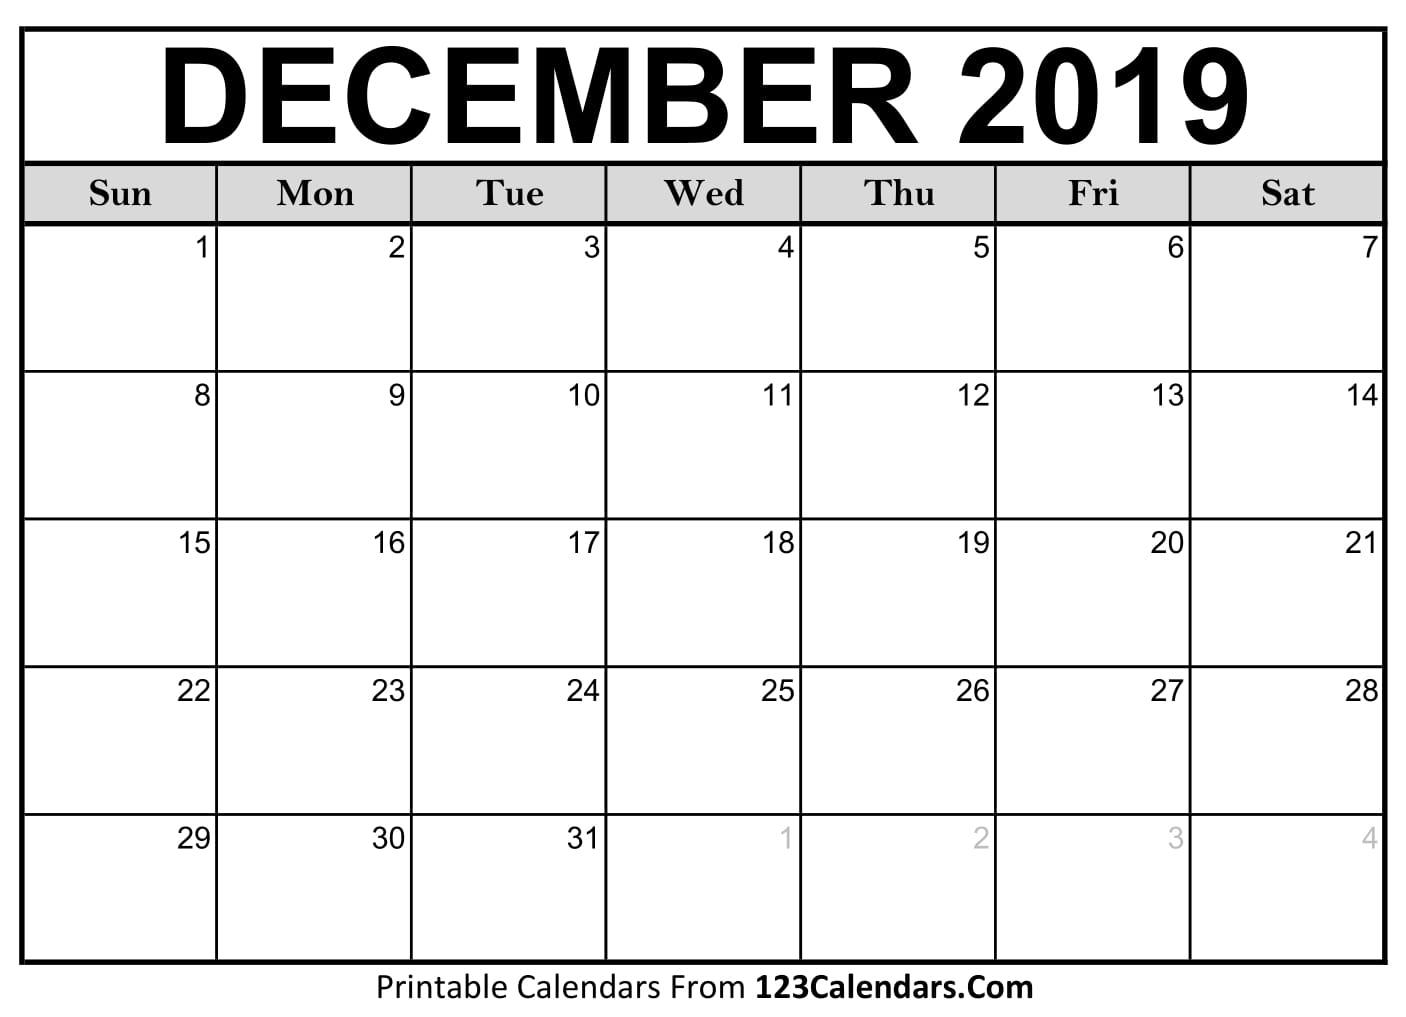 December 2019 Printable Calendar | 123Calendars for Blank Dec Calendar Pages